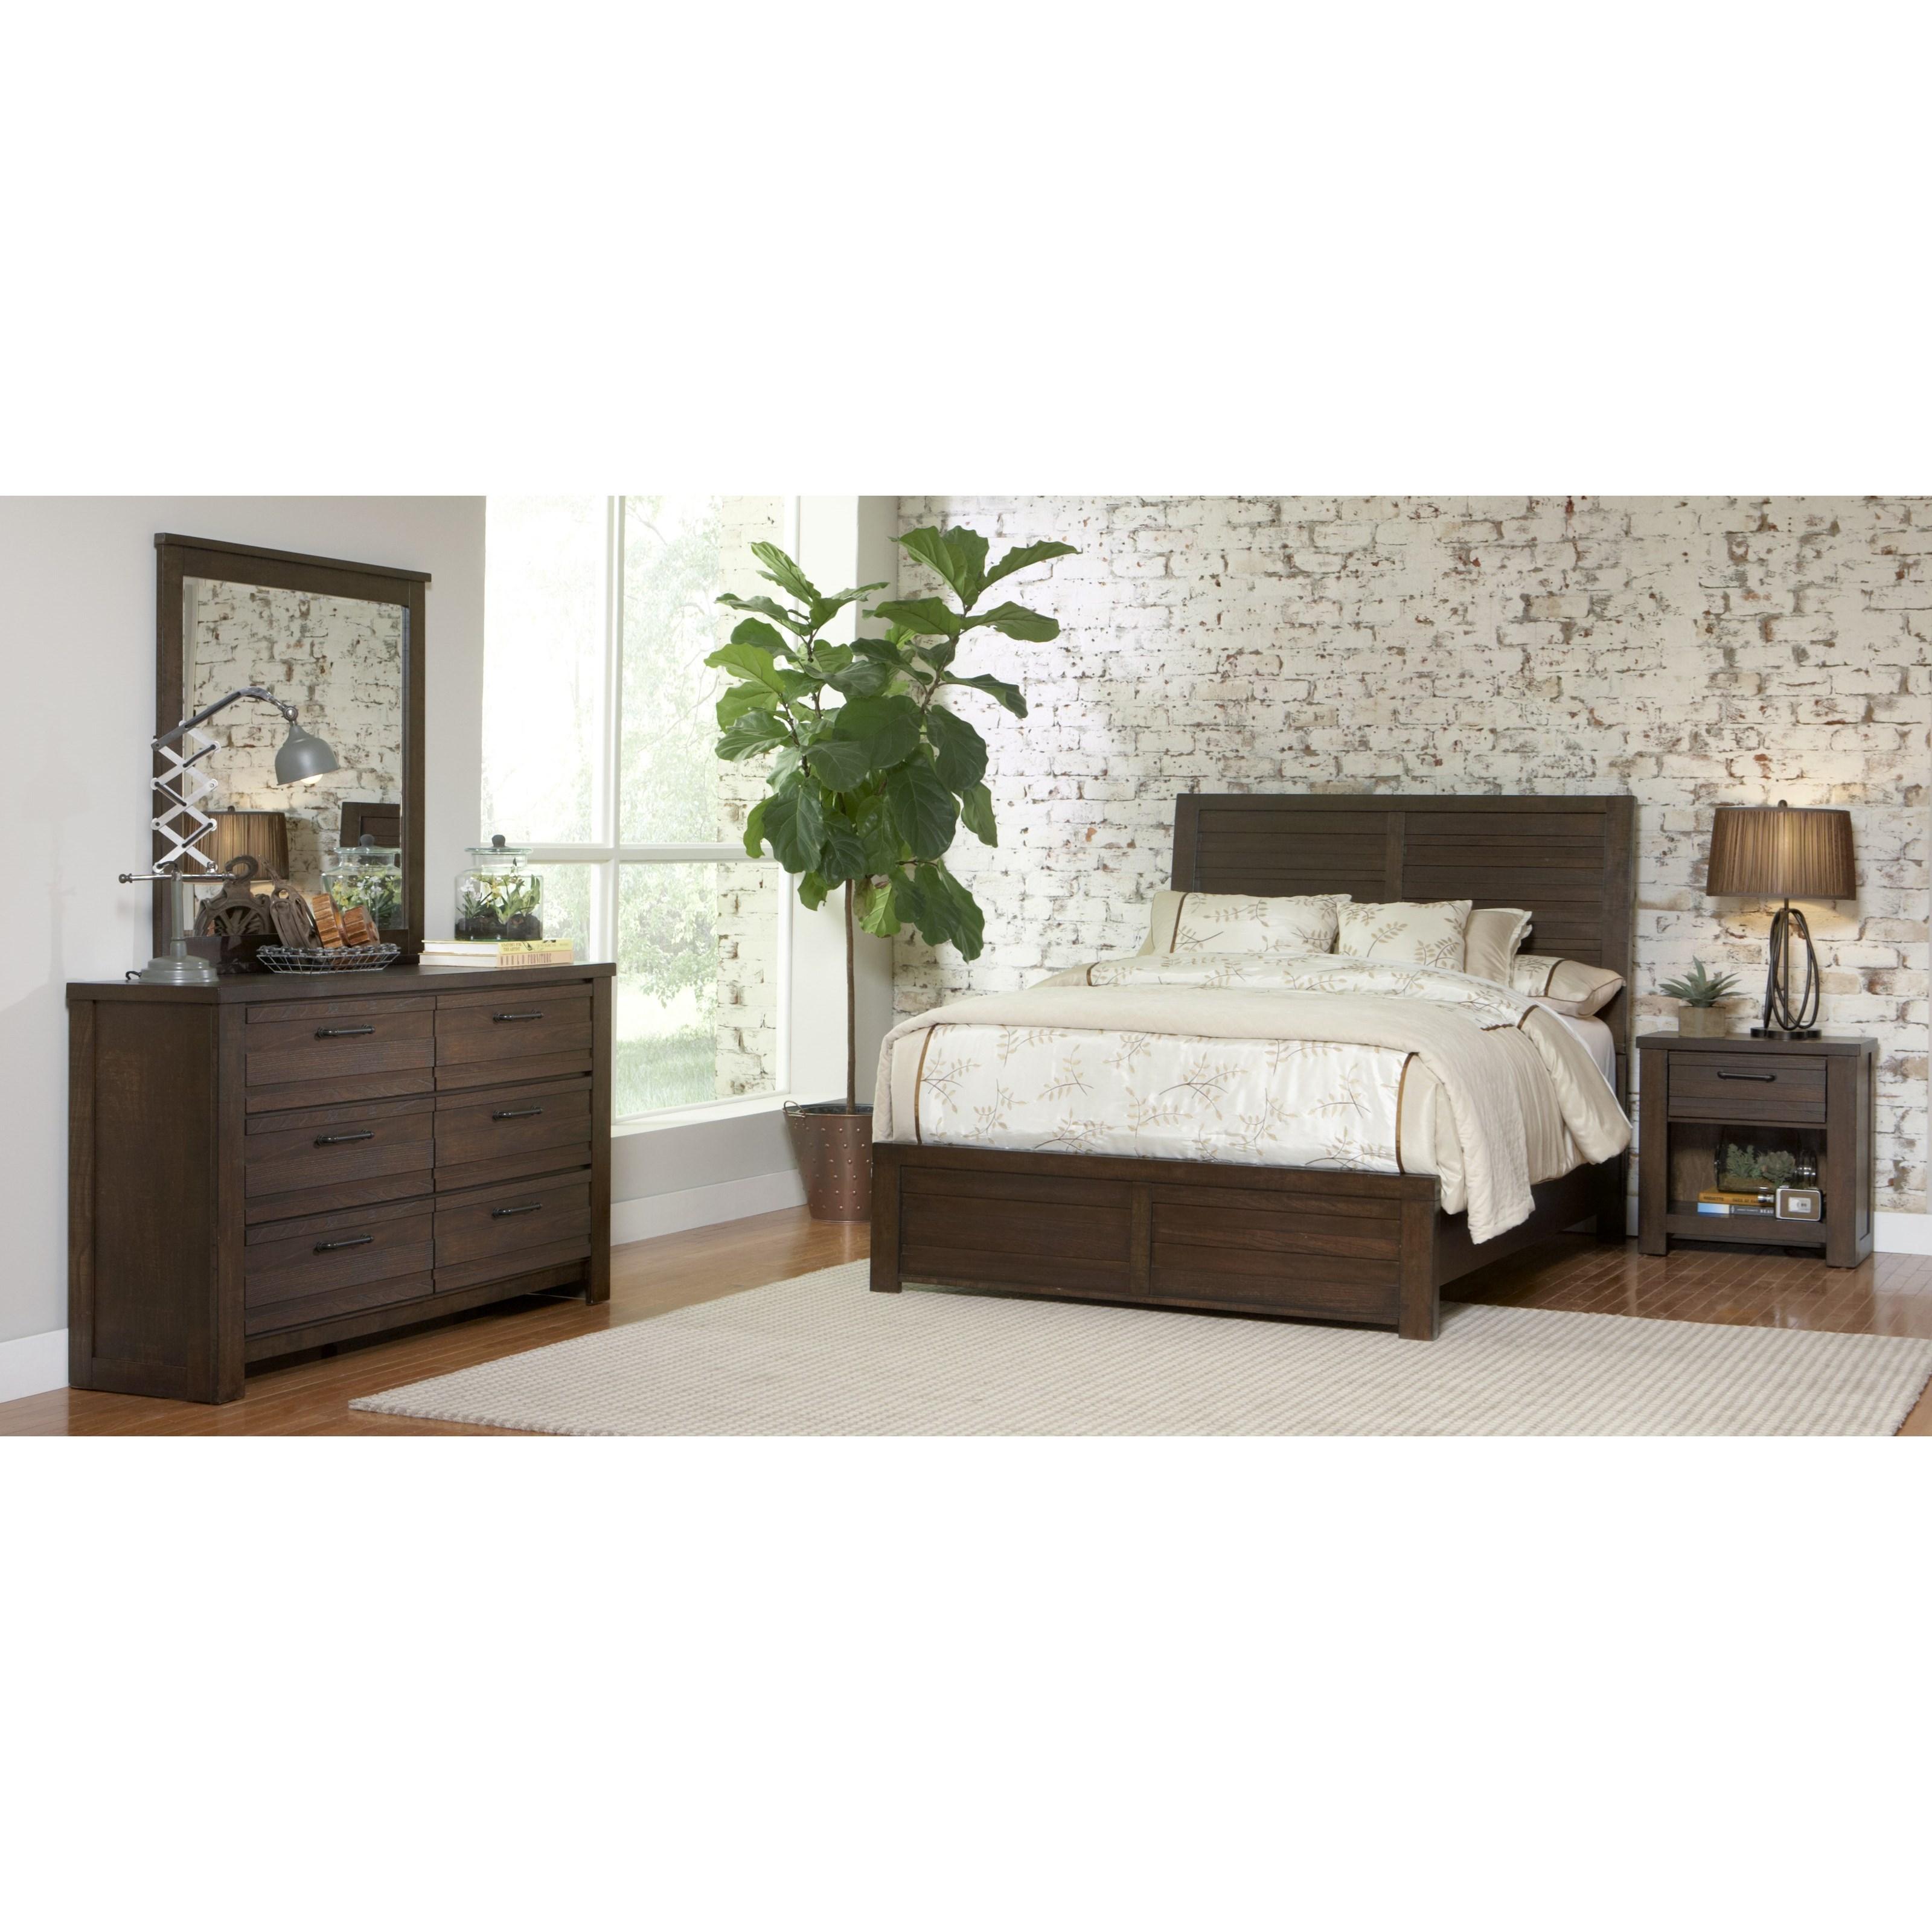 Ruff Hewn California King Bedroom Group by Samuel Lawrence at Carolina Direct